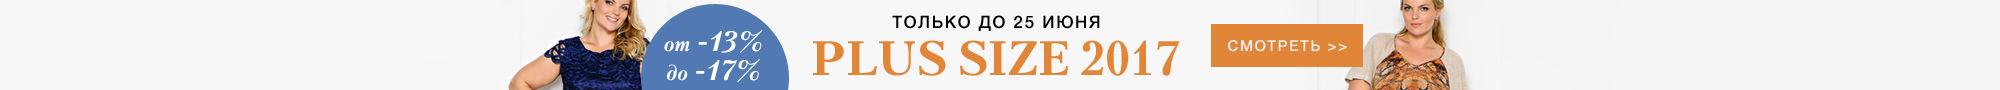 Скидки от -13% до -17% на коллекцию Plus Size - 2017